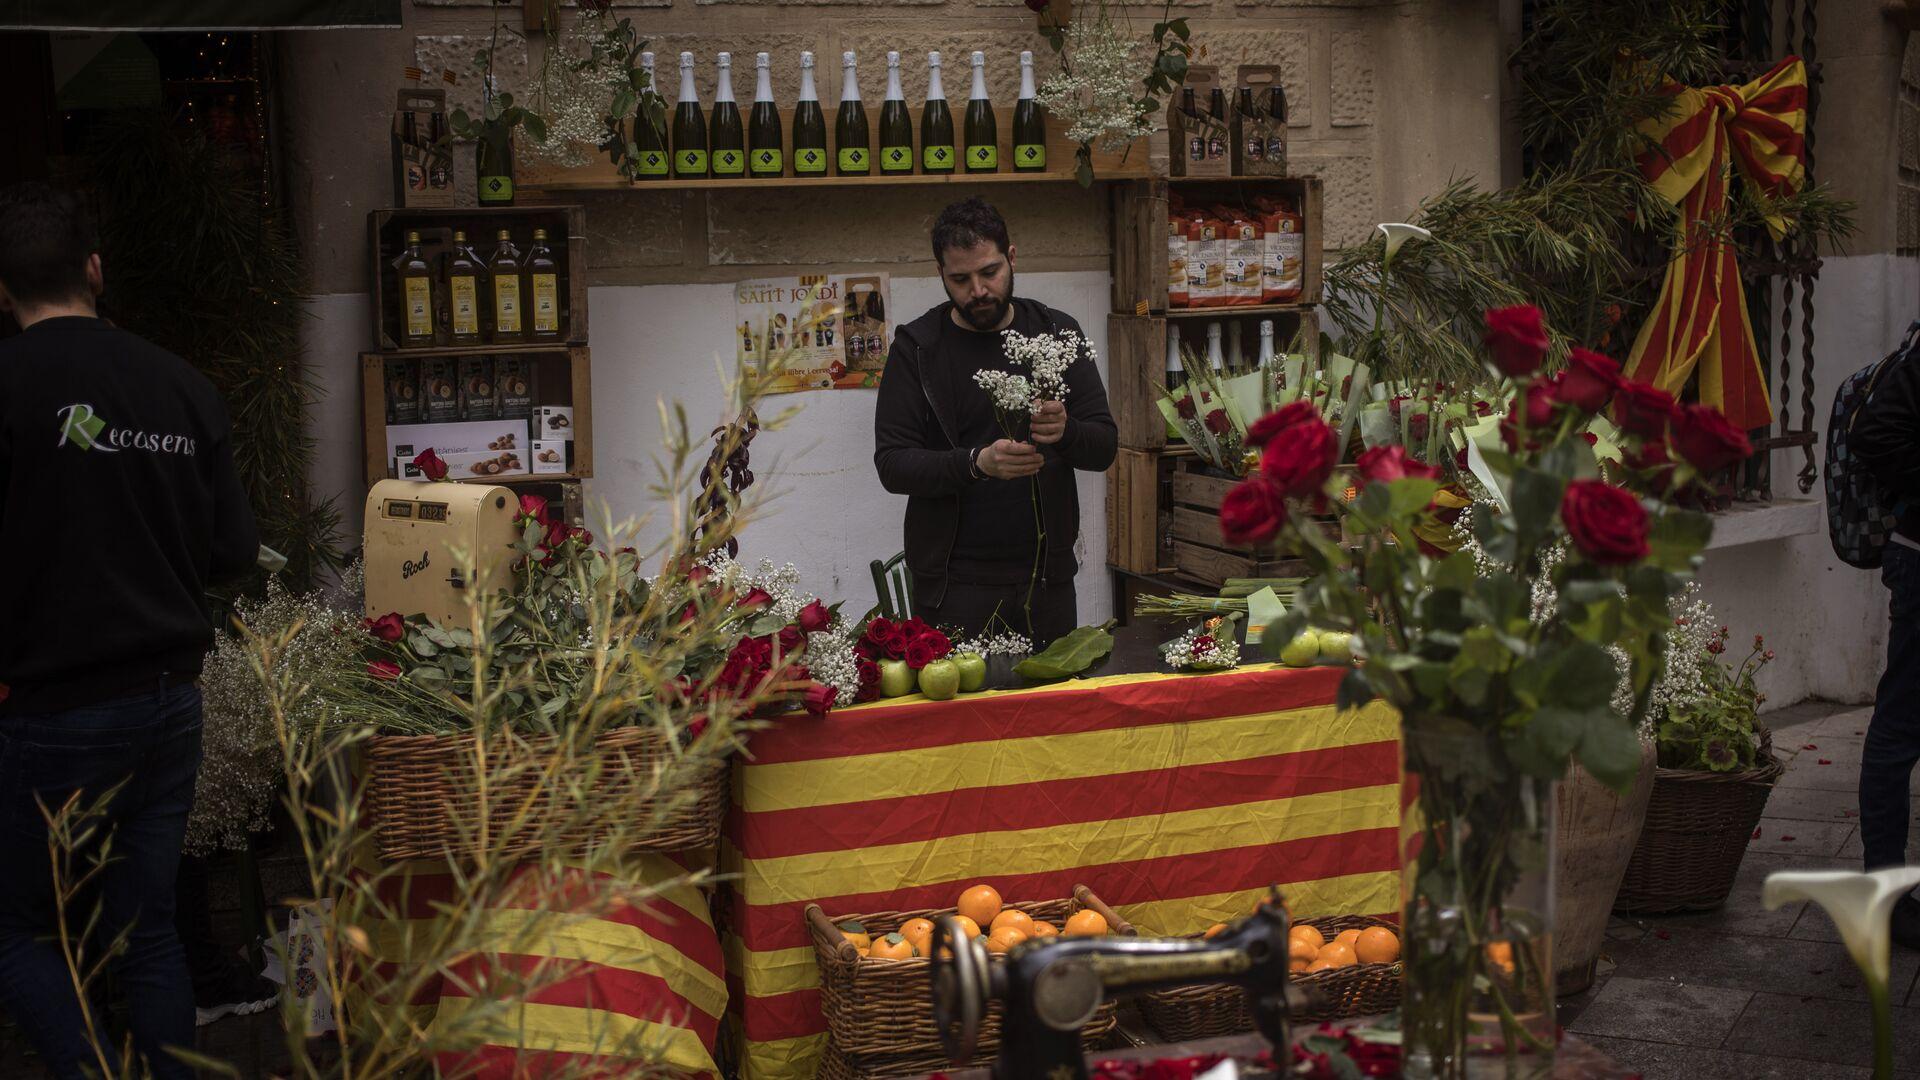 Un vendedor de flores en Barcelona (archivo) - Sputnik Mundo, 1920, 23.04.2021